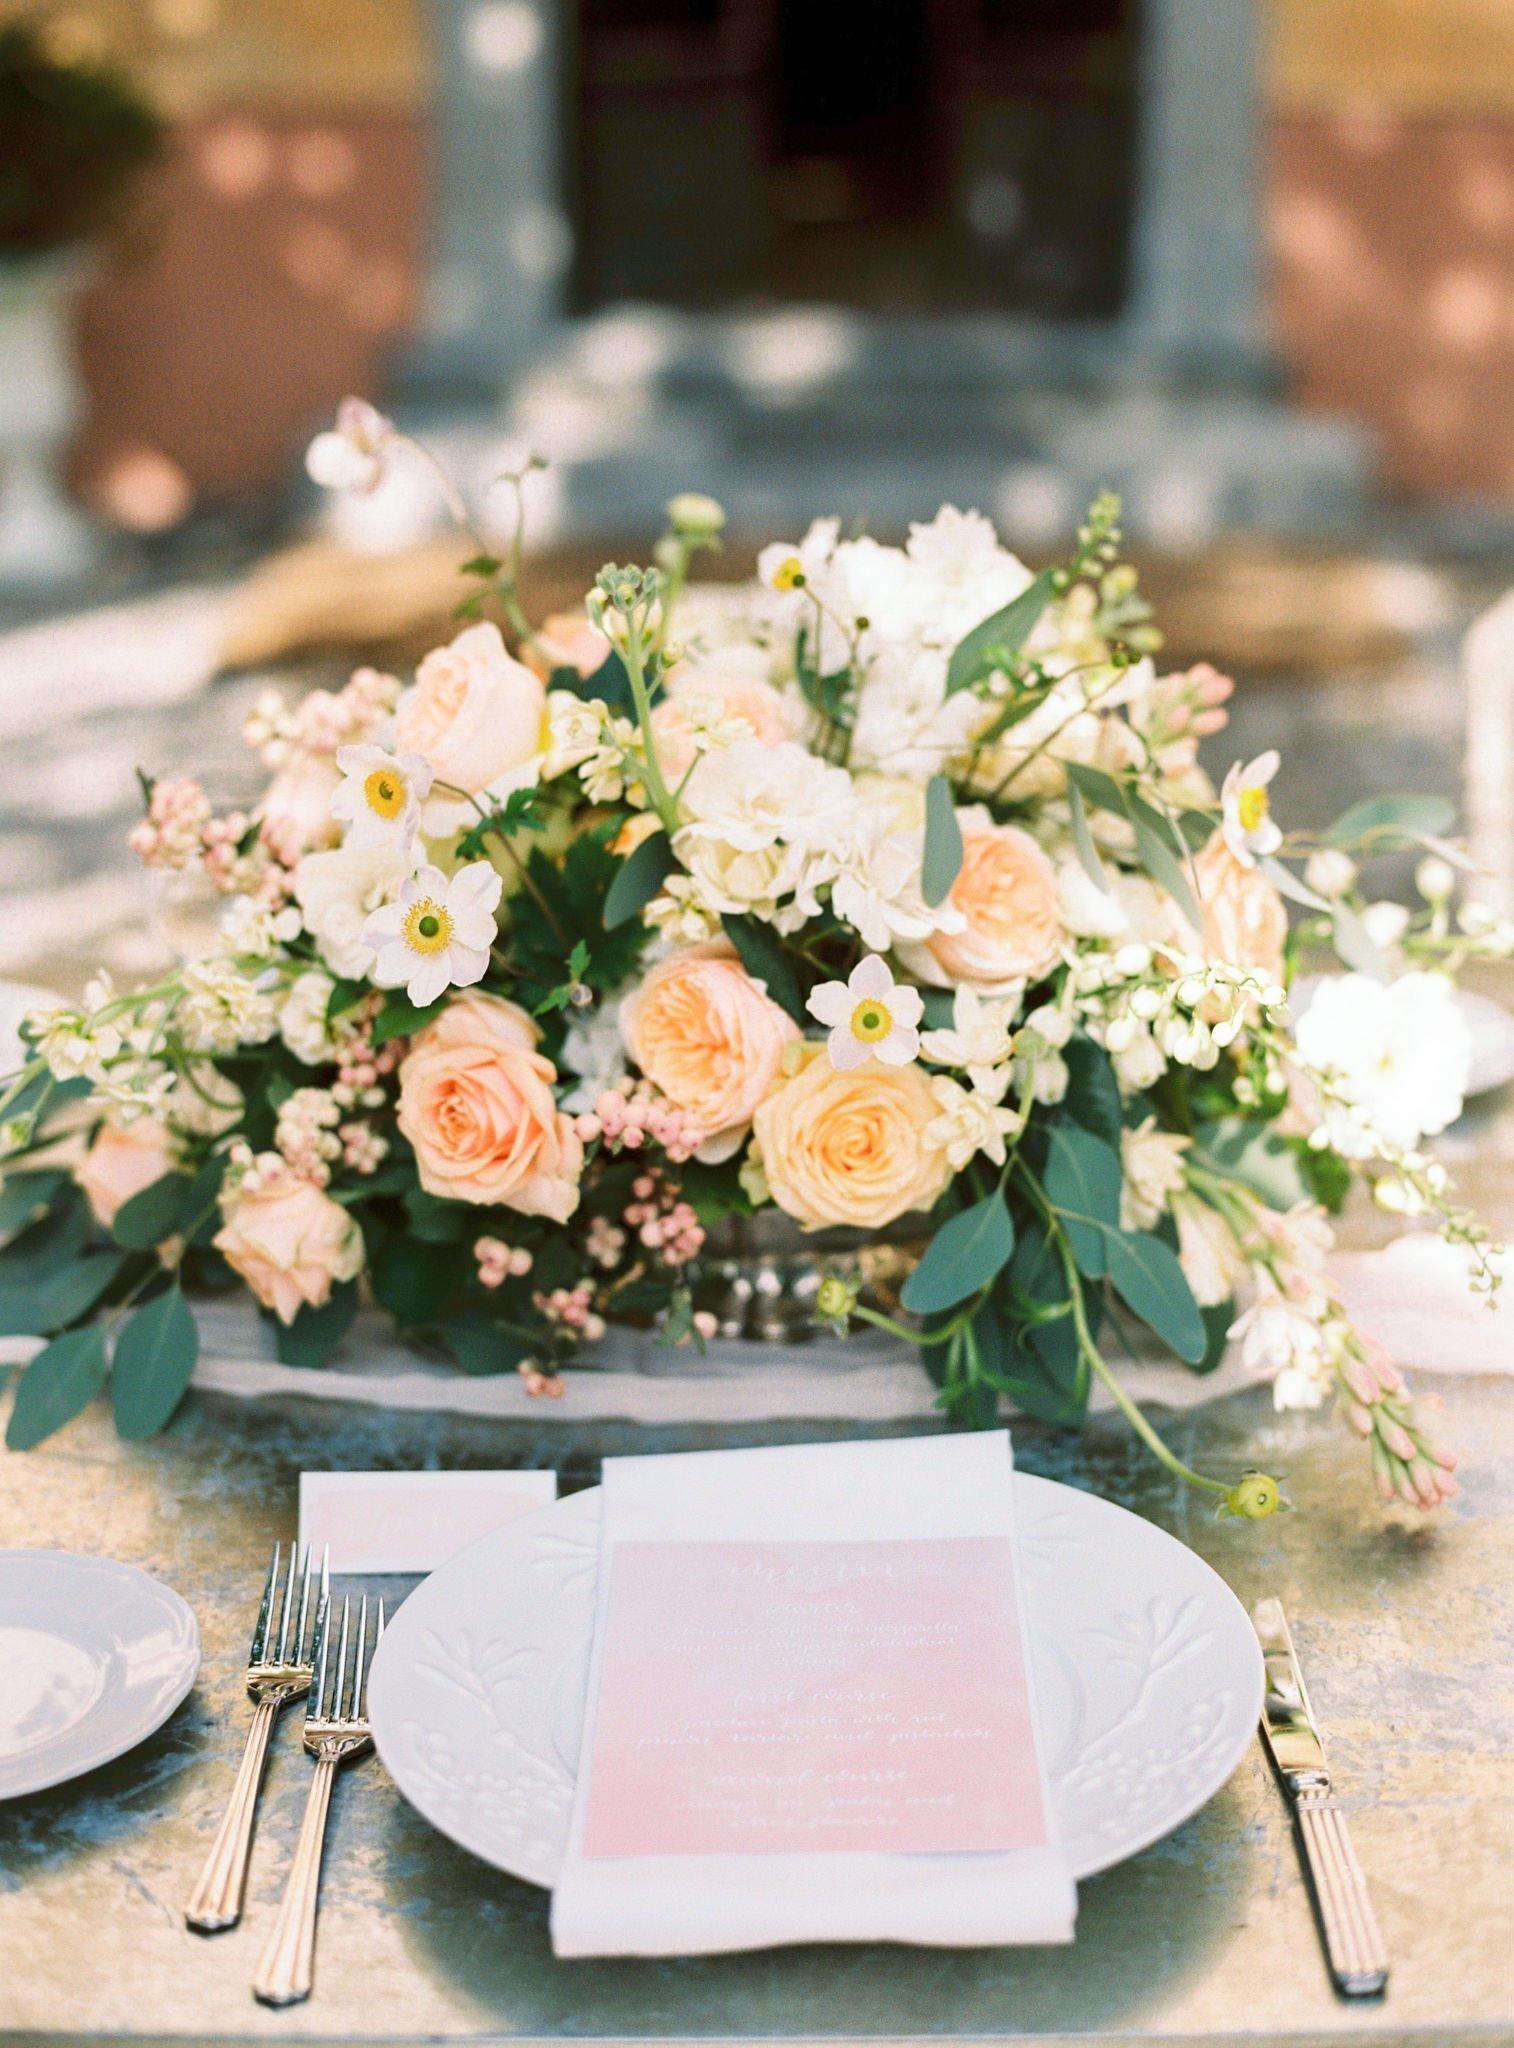 italy-lake-como-elopement-wedding-planner-flower-designer-213